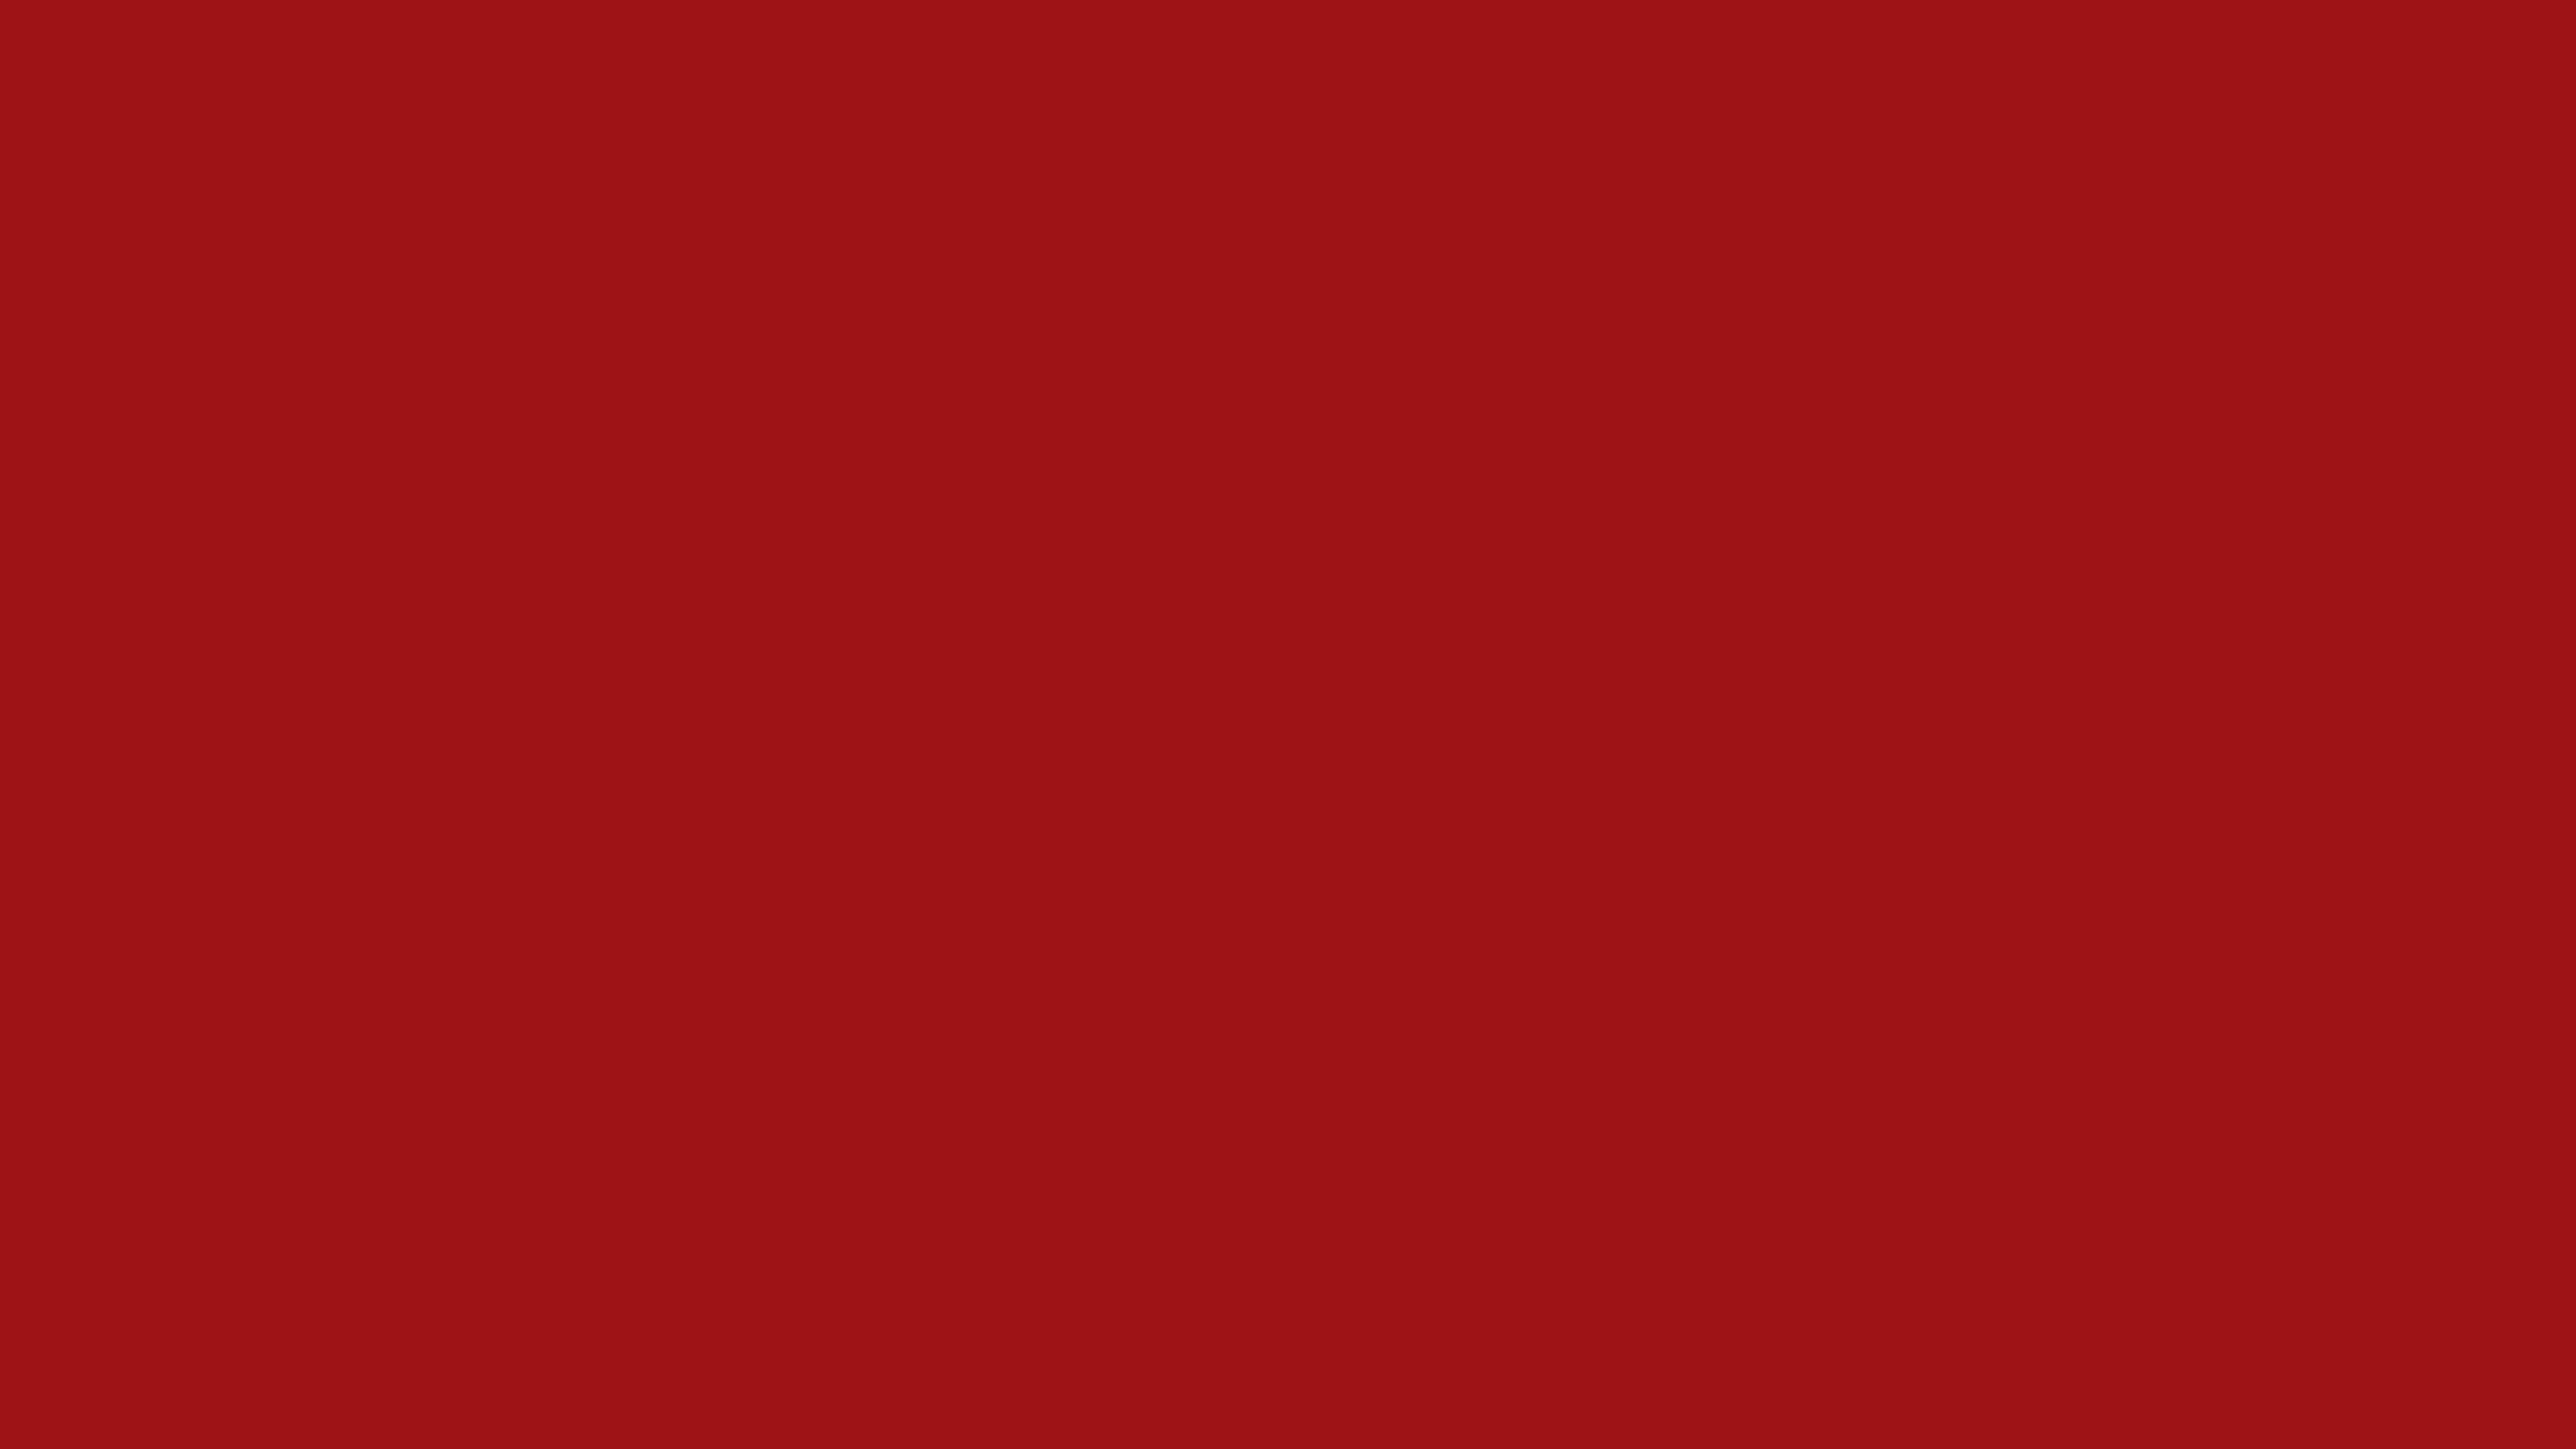 4096x2304 Spartan Crimson Solid Color Background